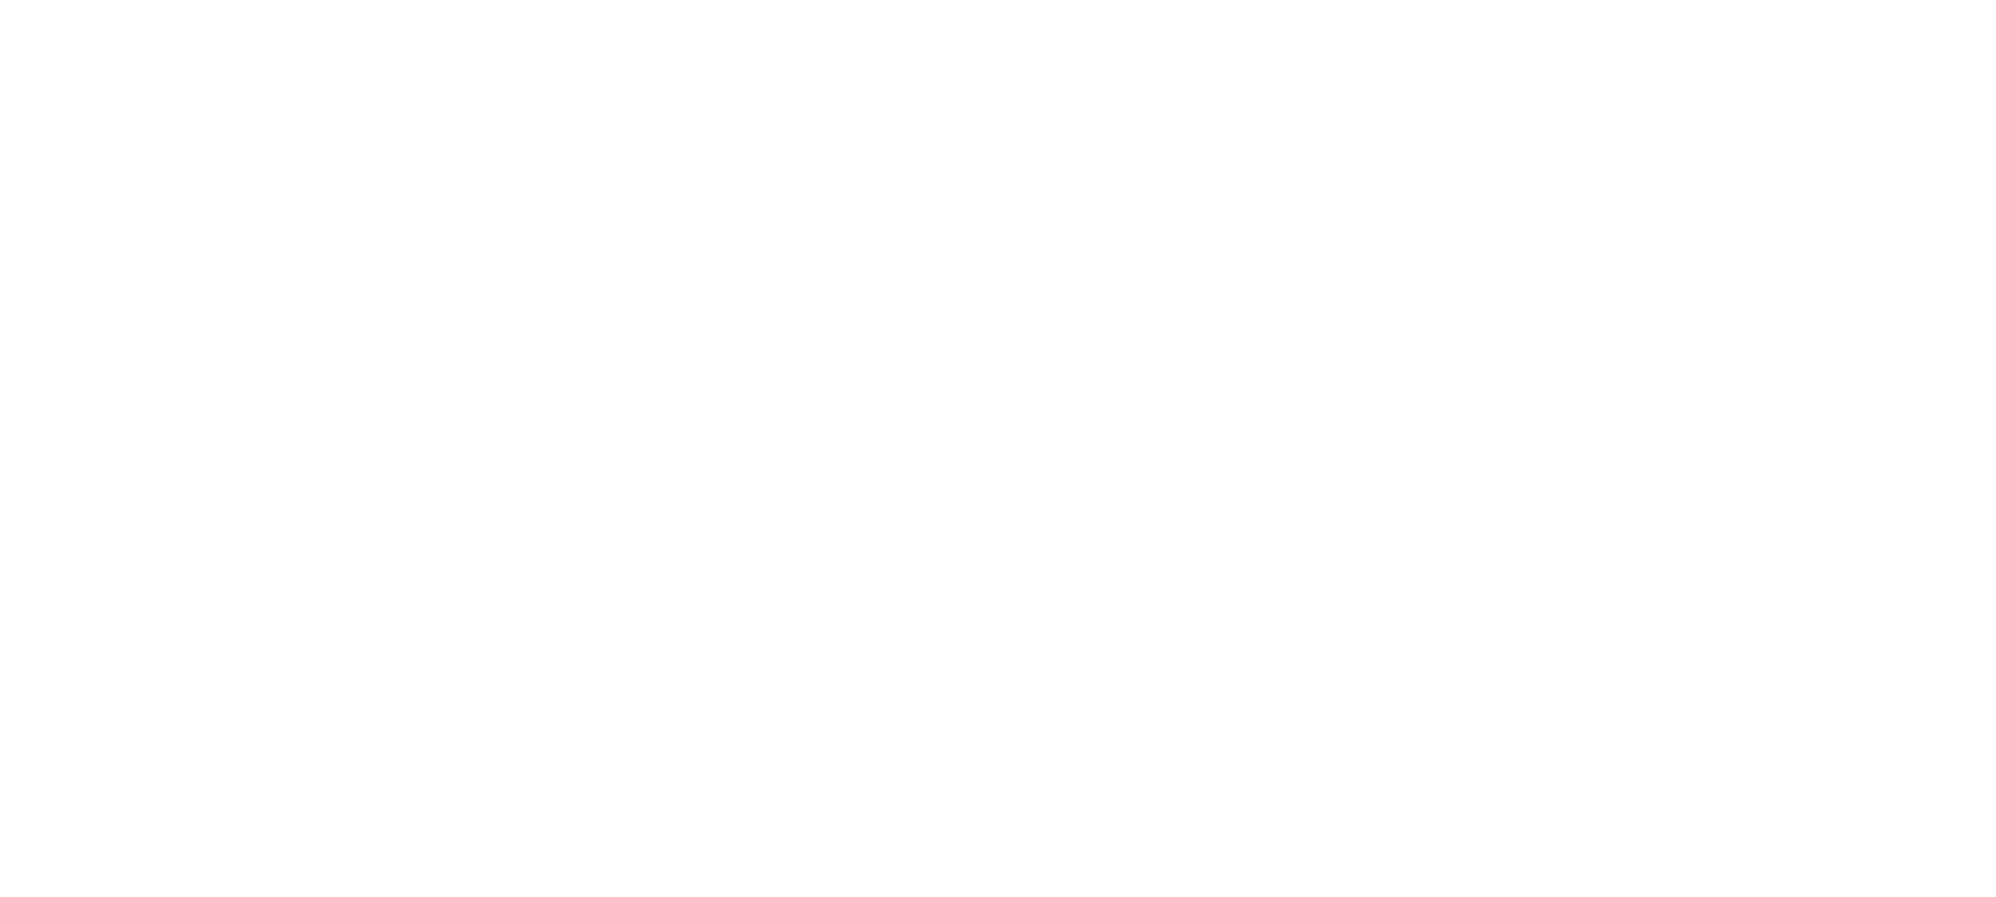 German_Design_Award_Nominee_2016_white